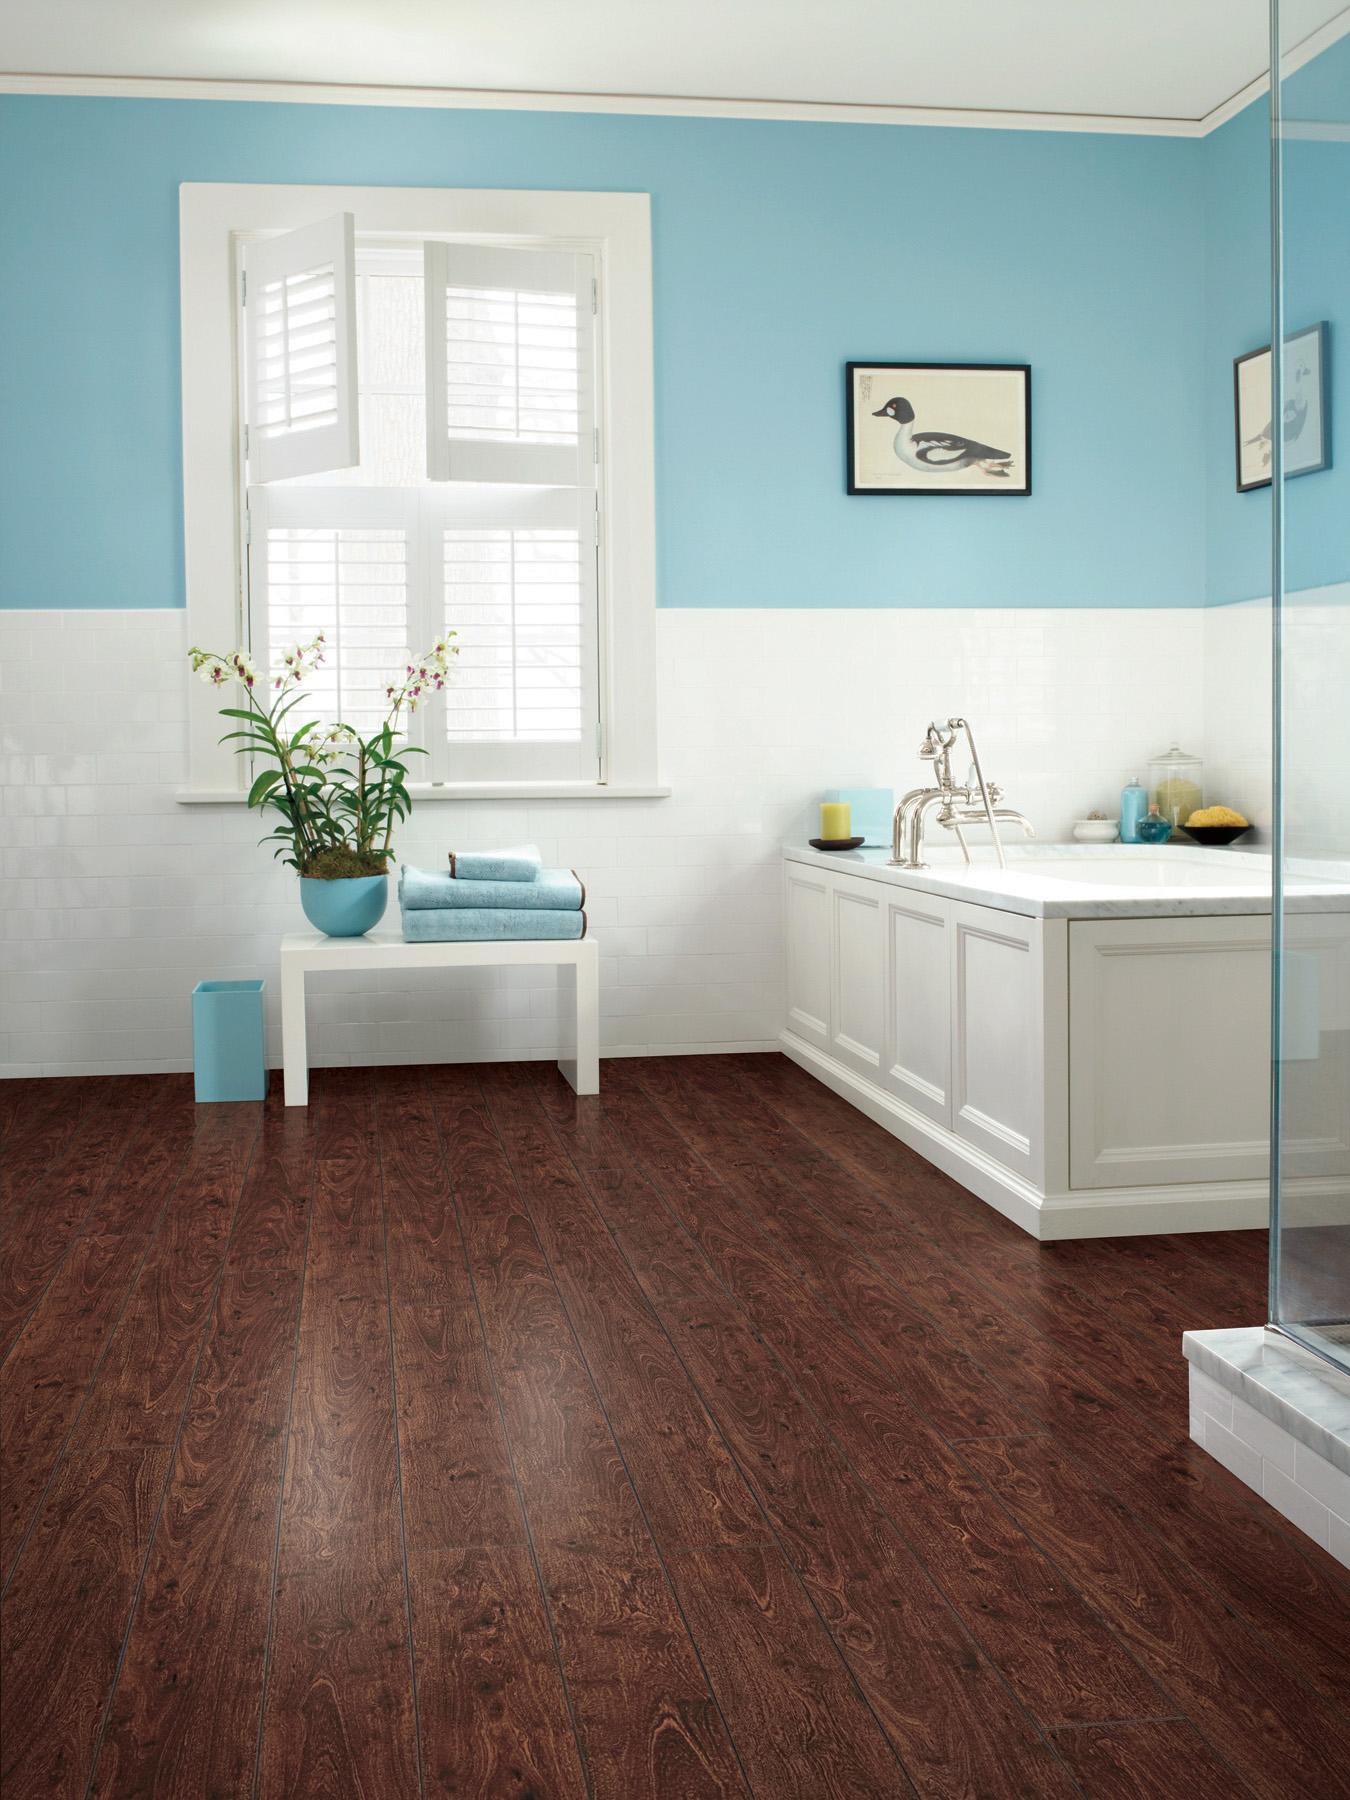 Comfortable 12 Inch Floor Tiles Thin 3 X 9 Subway Tile Solid 8X8 Ceramic Floor Tile 8X8 White Floor Tile Young Accent Backsplash Tiles OrangeAcoustic Ceiling Tile Laminate Bathroom Floors | HGTV